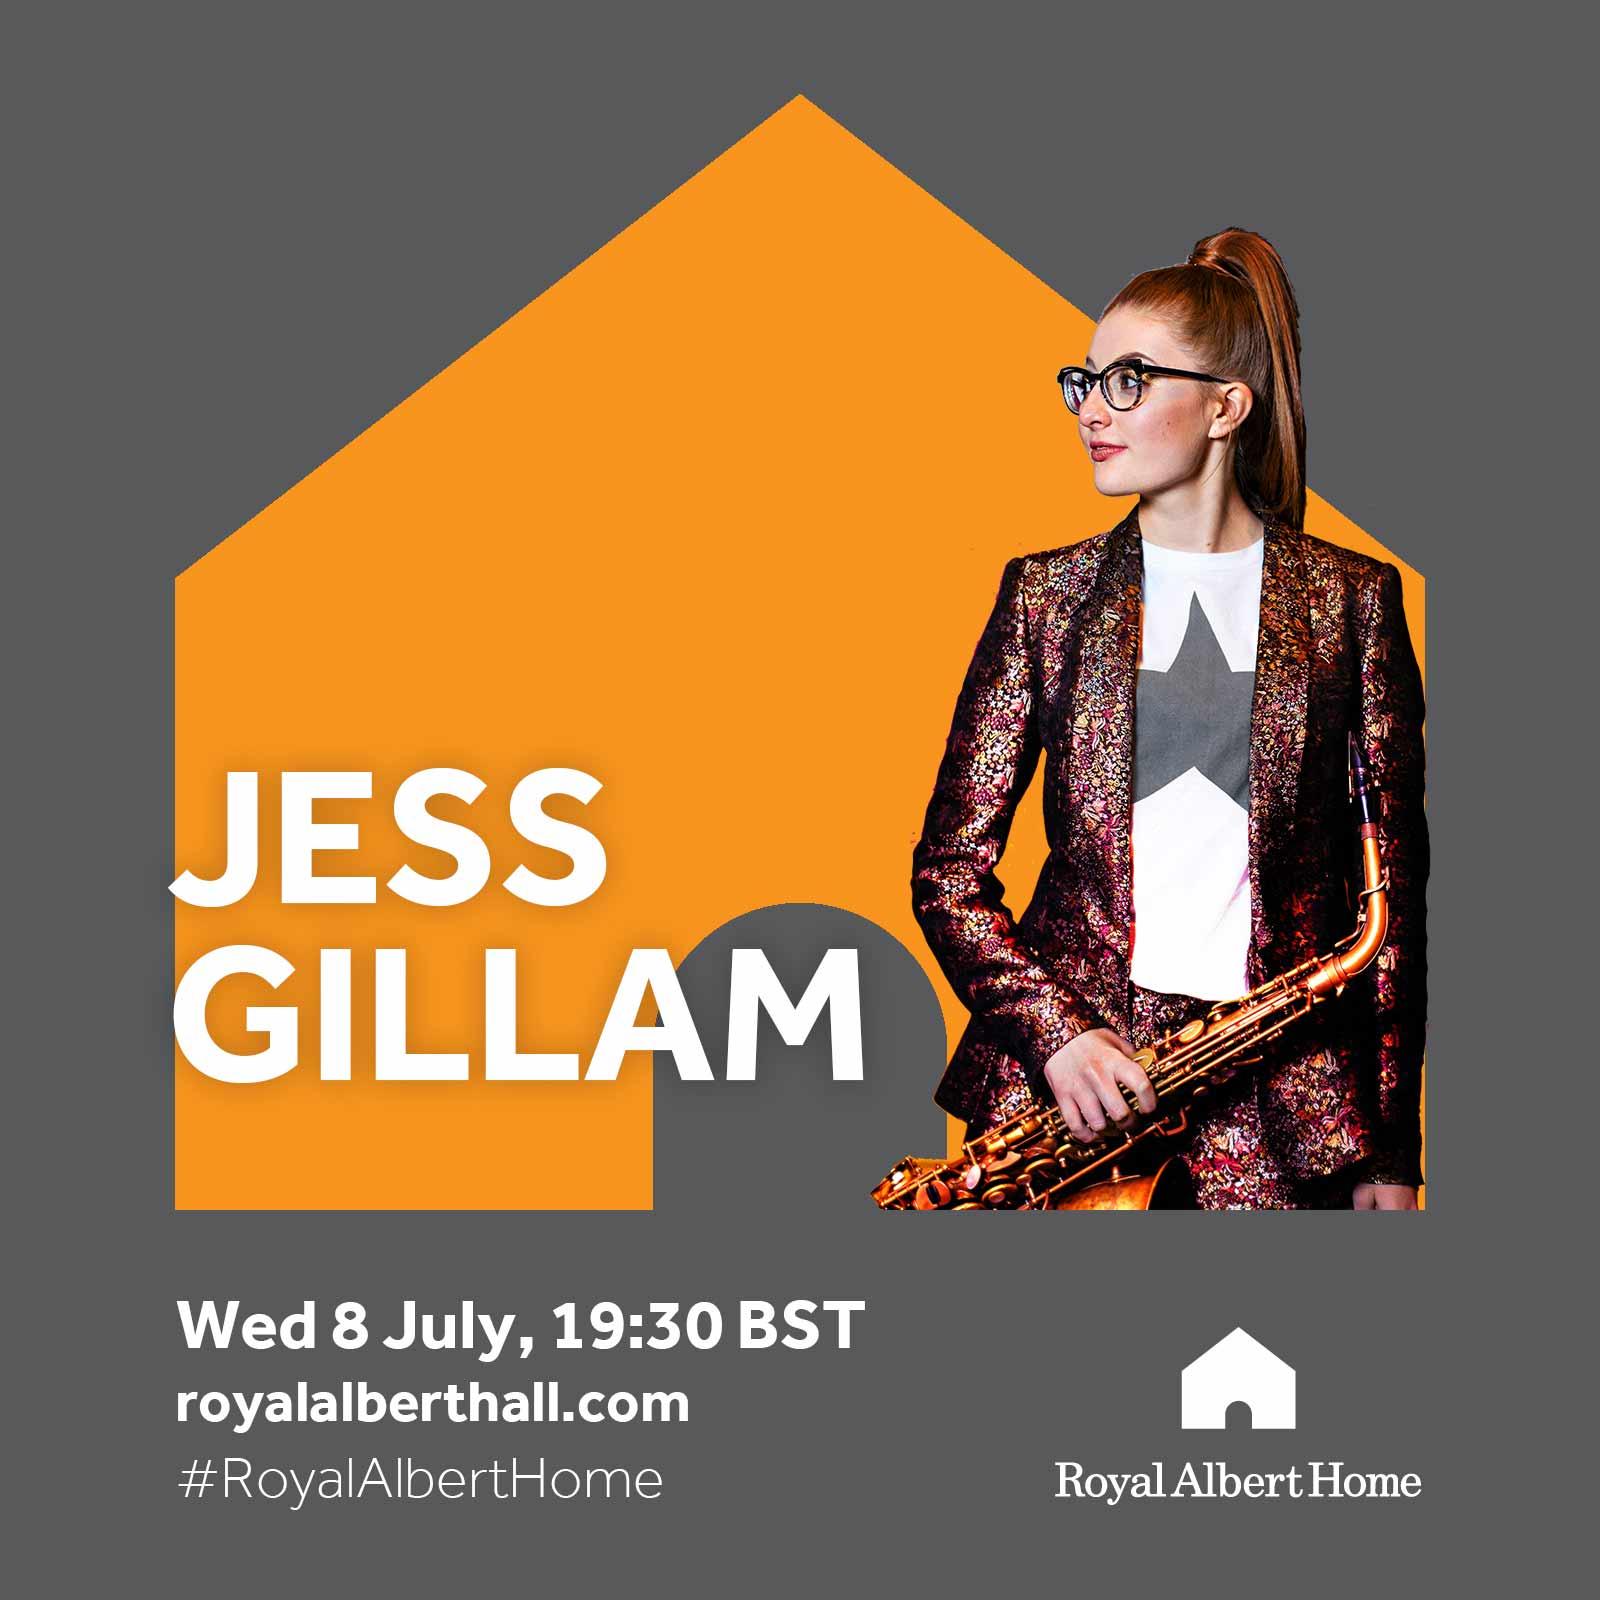 Jess plays Royal Albert Home series